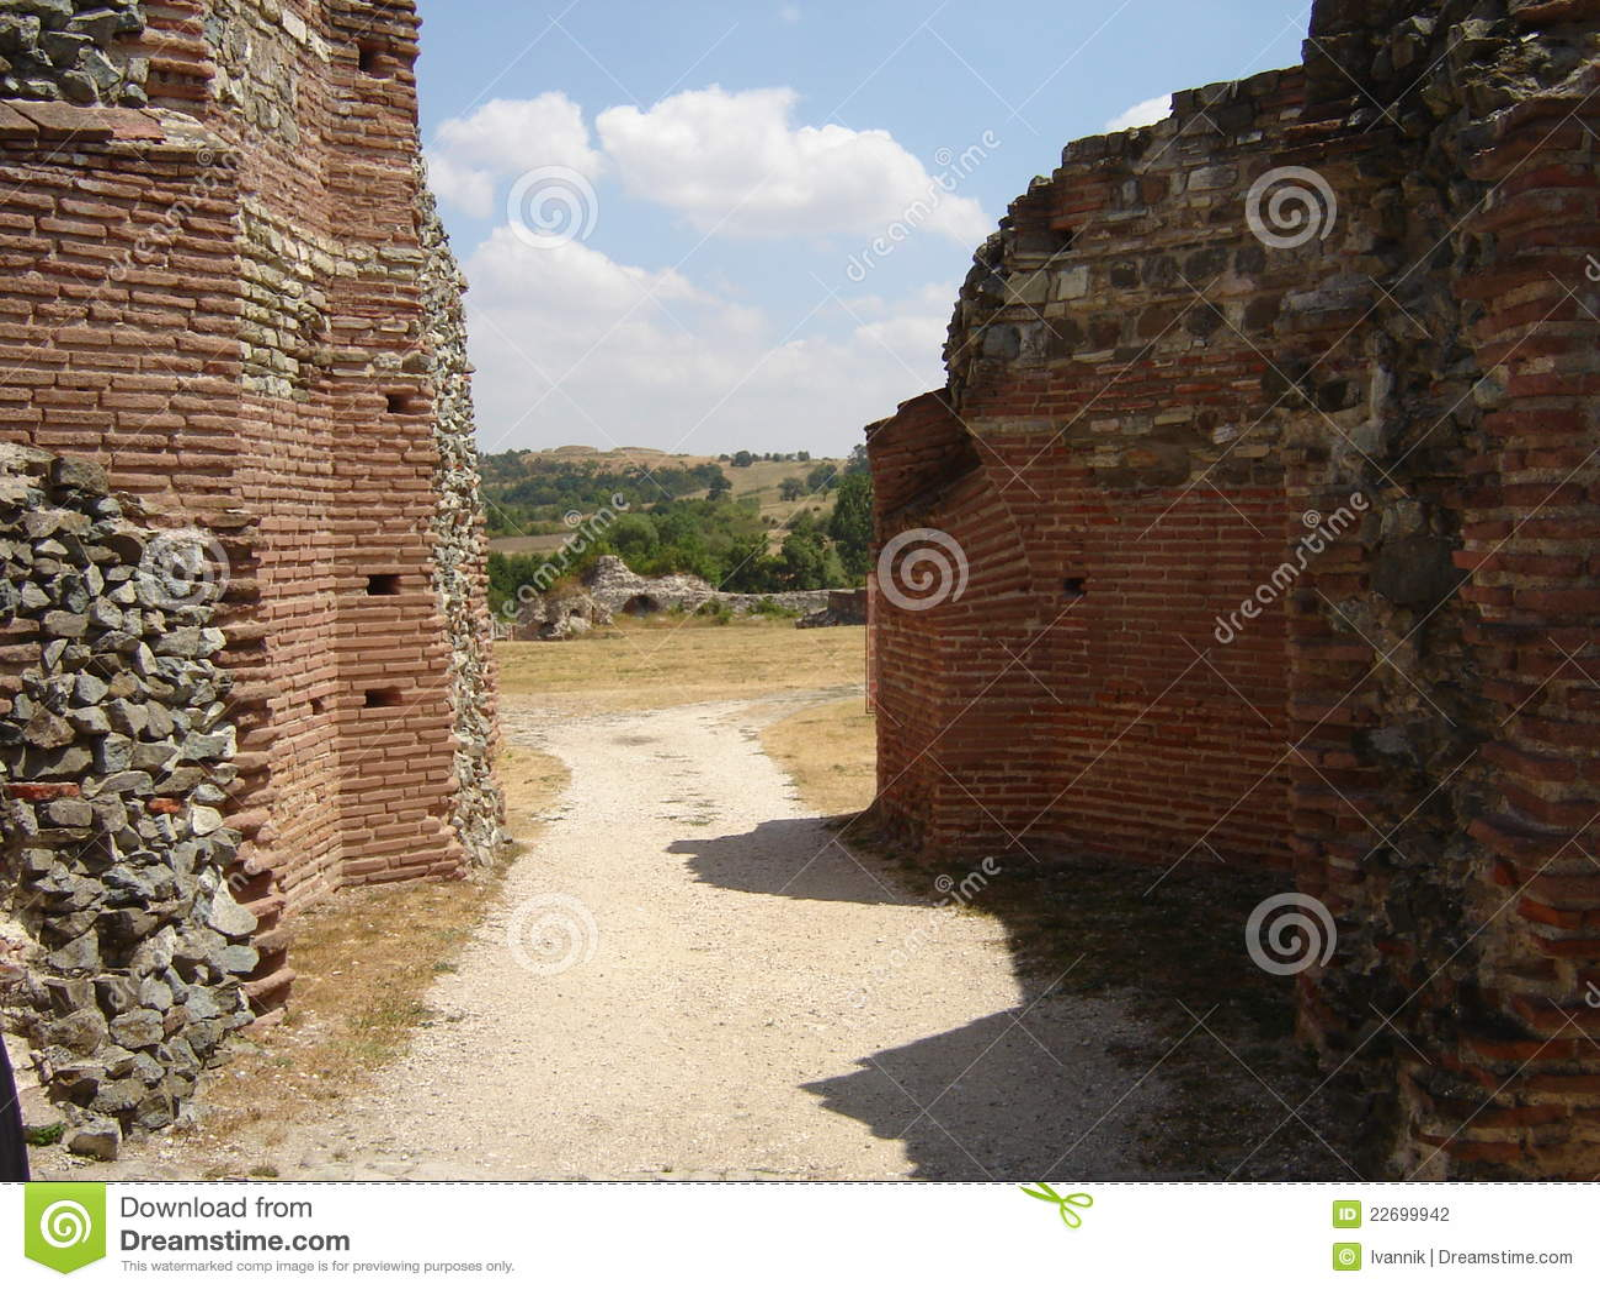 Road to Roman villa